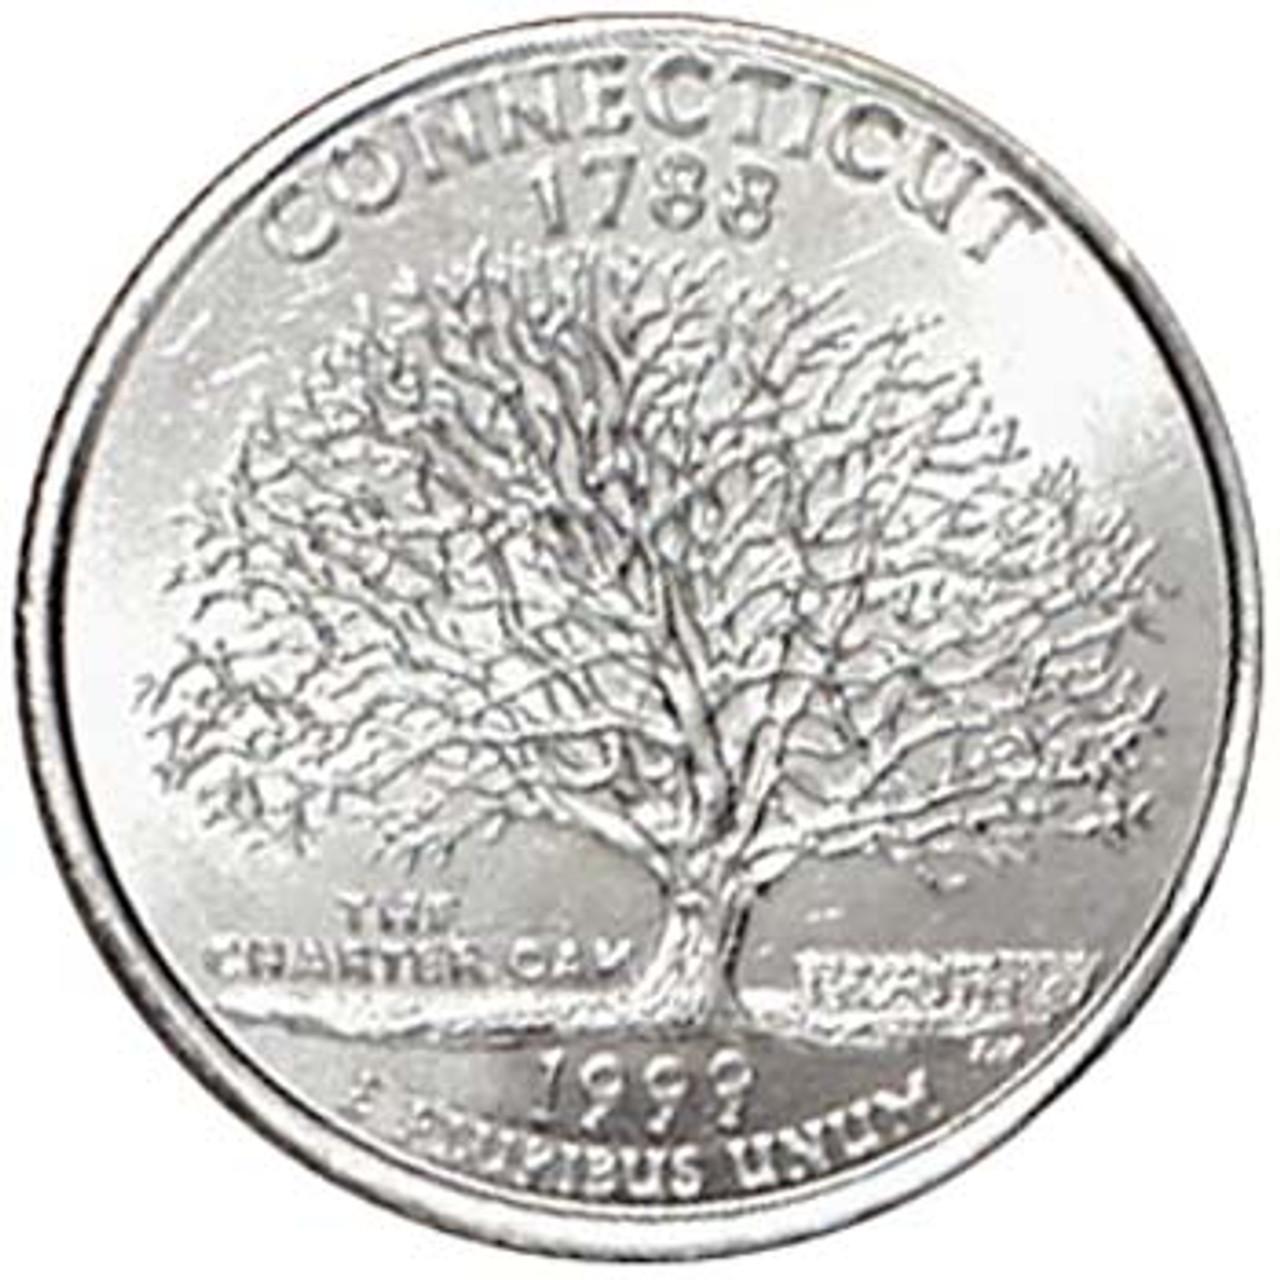 1999-D Connecticut Quarter Brilliant Uncirculated Image 1